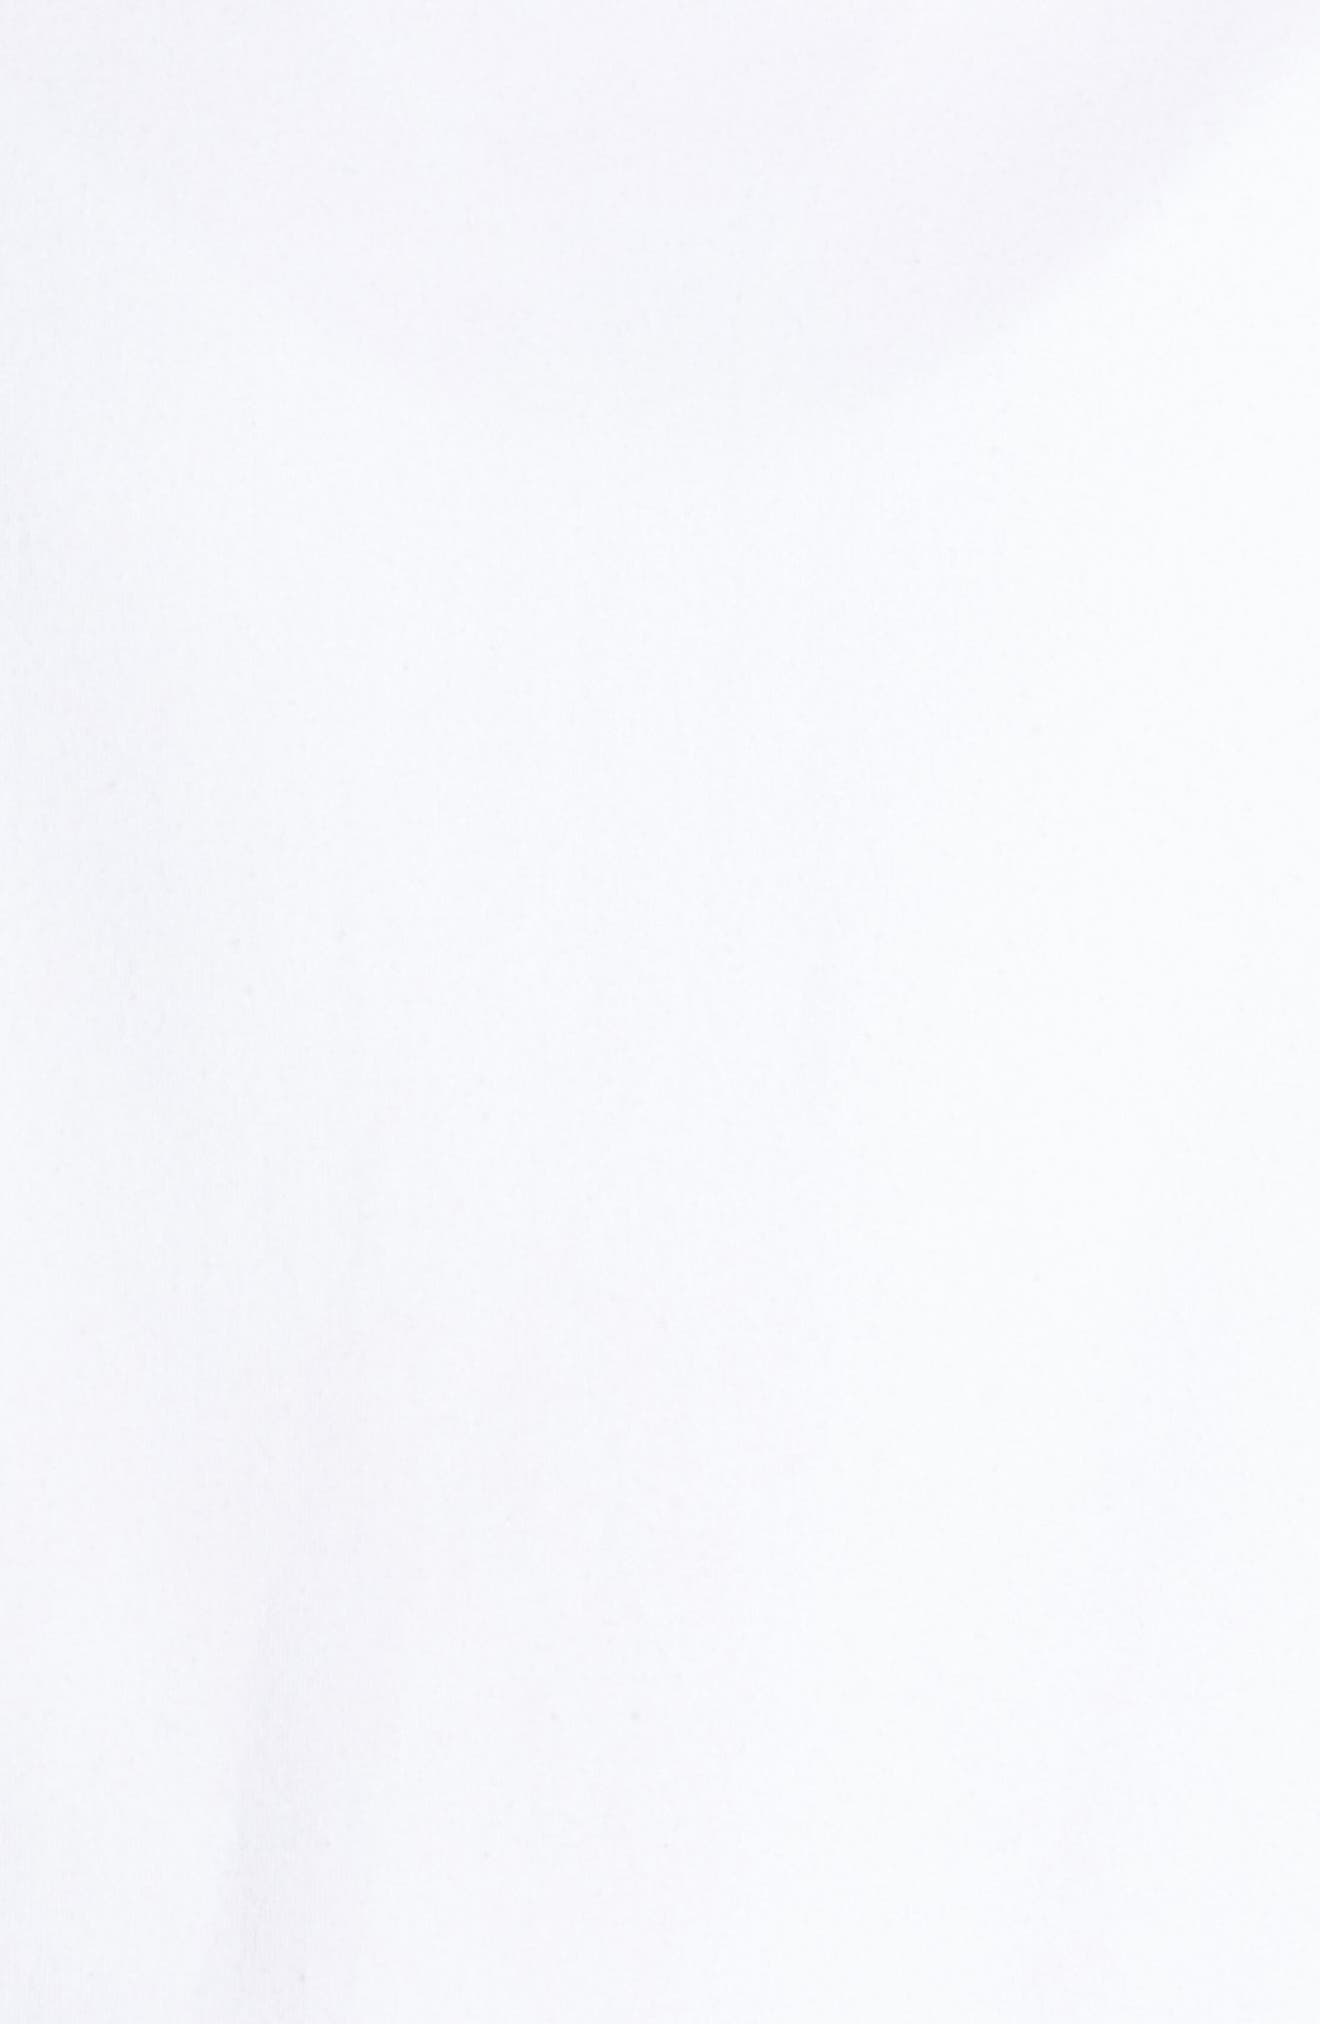 Notch Hoodie Sweatshirt,                             Alternate thumbnail 6, color,                             WHITE